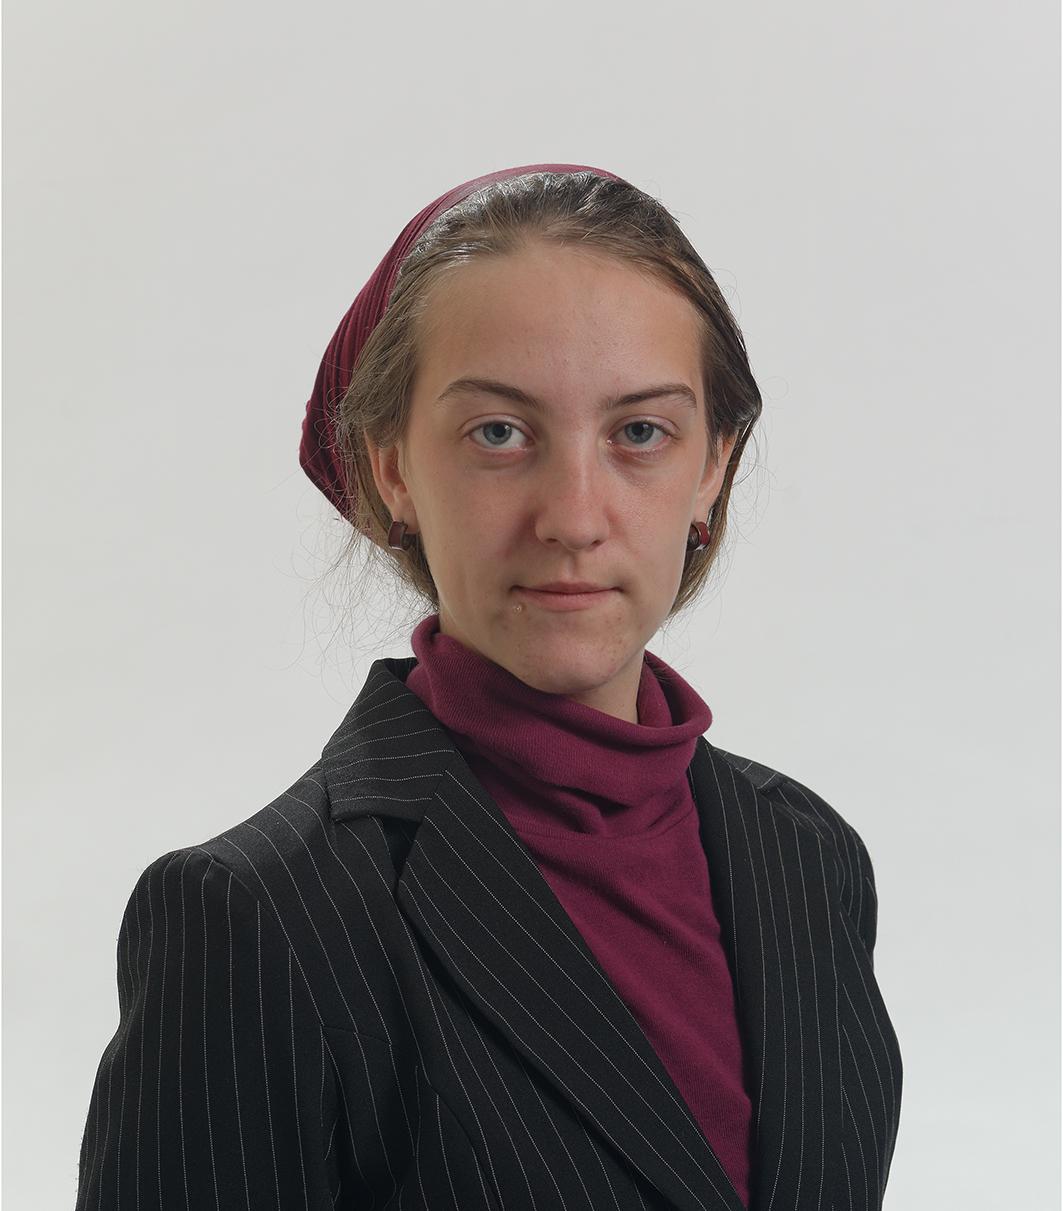 Cllr Laura Hodgkinson